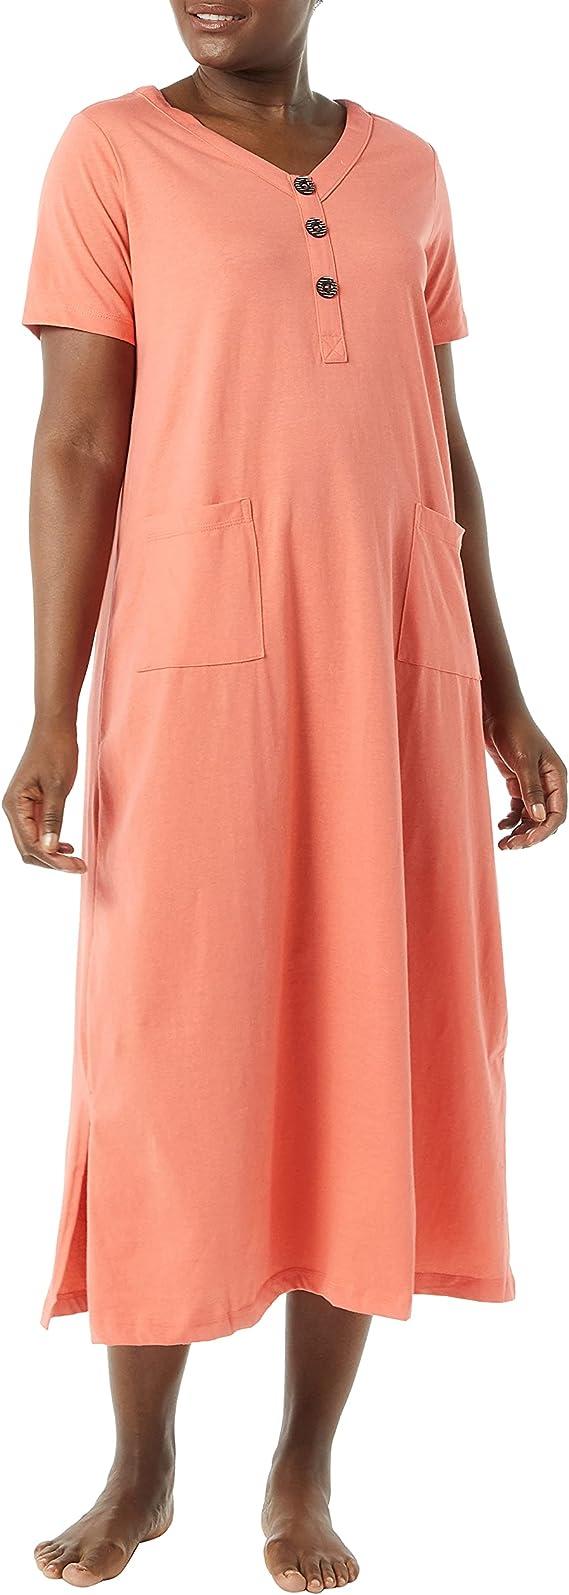 Dreamscape Maternity Lounge Dress Full length Sleep Shirt with pockets Soft Jersey Organic Cotton Nursing Dress House Dress